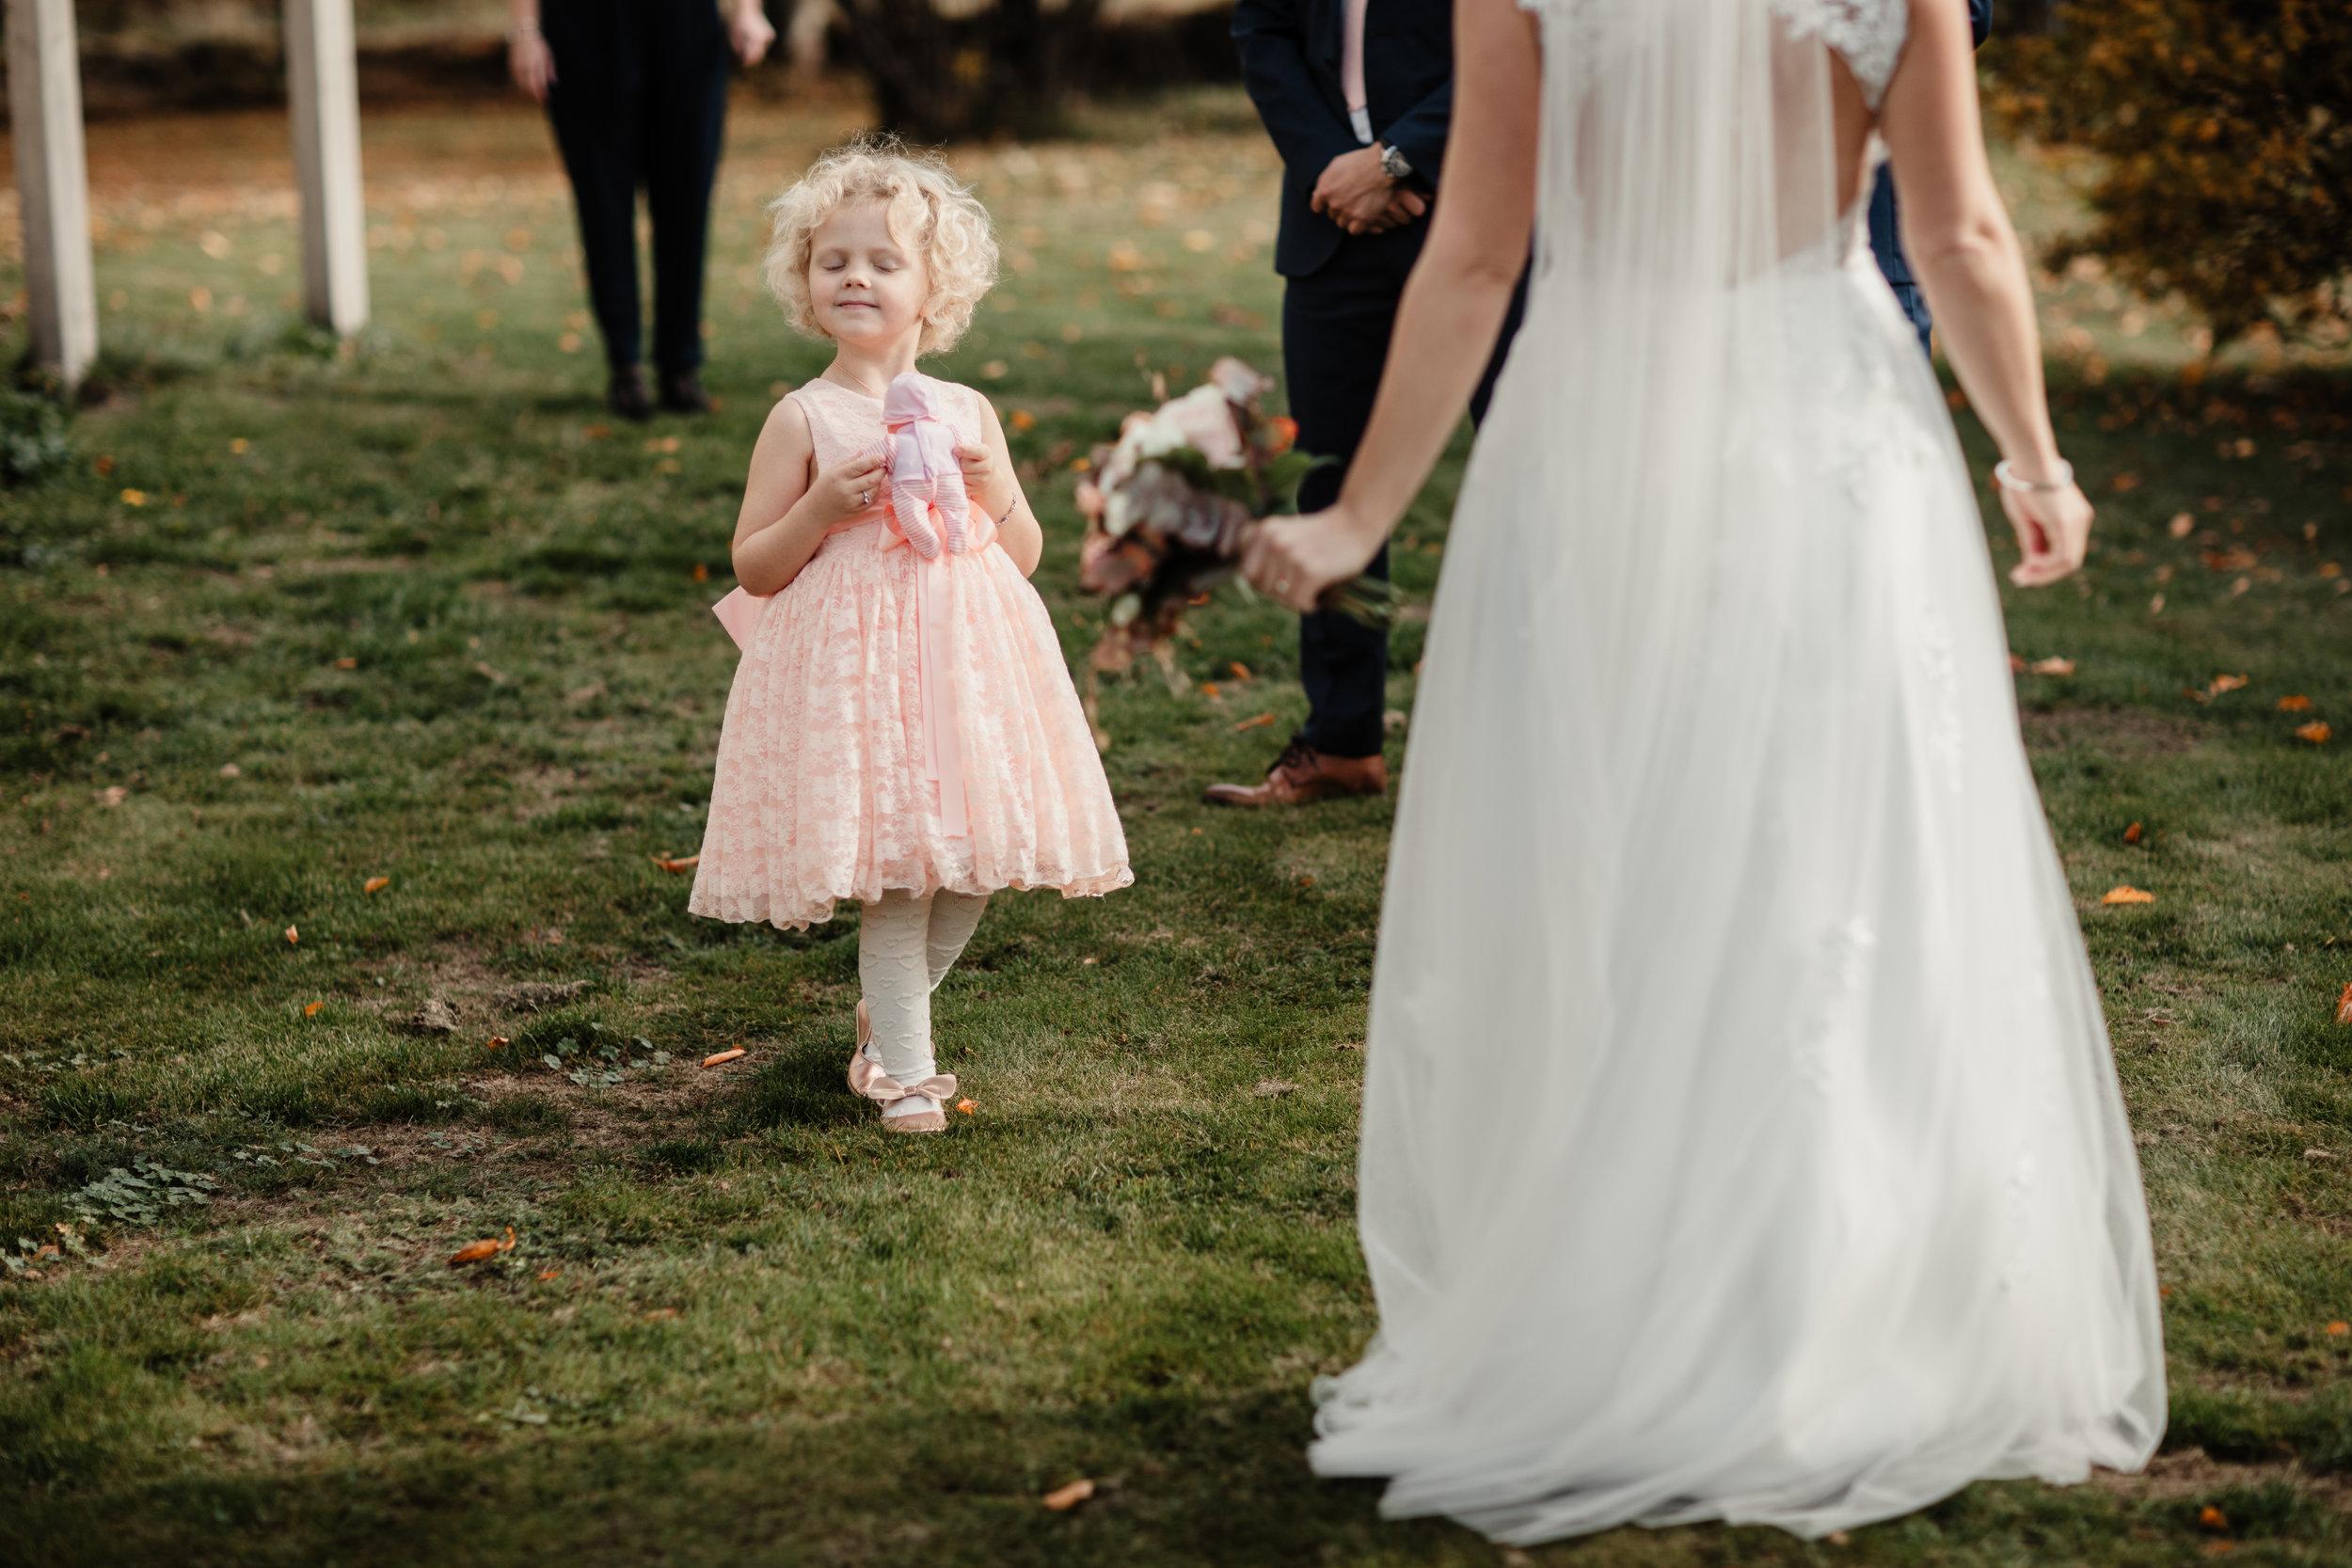 Bröllopsfotograf-Uddetorp Säteri-Höstbröllop-Fotograf Emilia- Bröllopsfotograf Borås-21.jpg